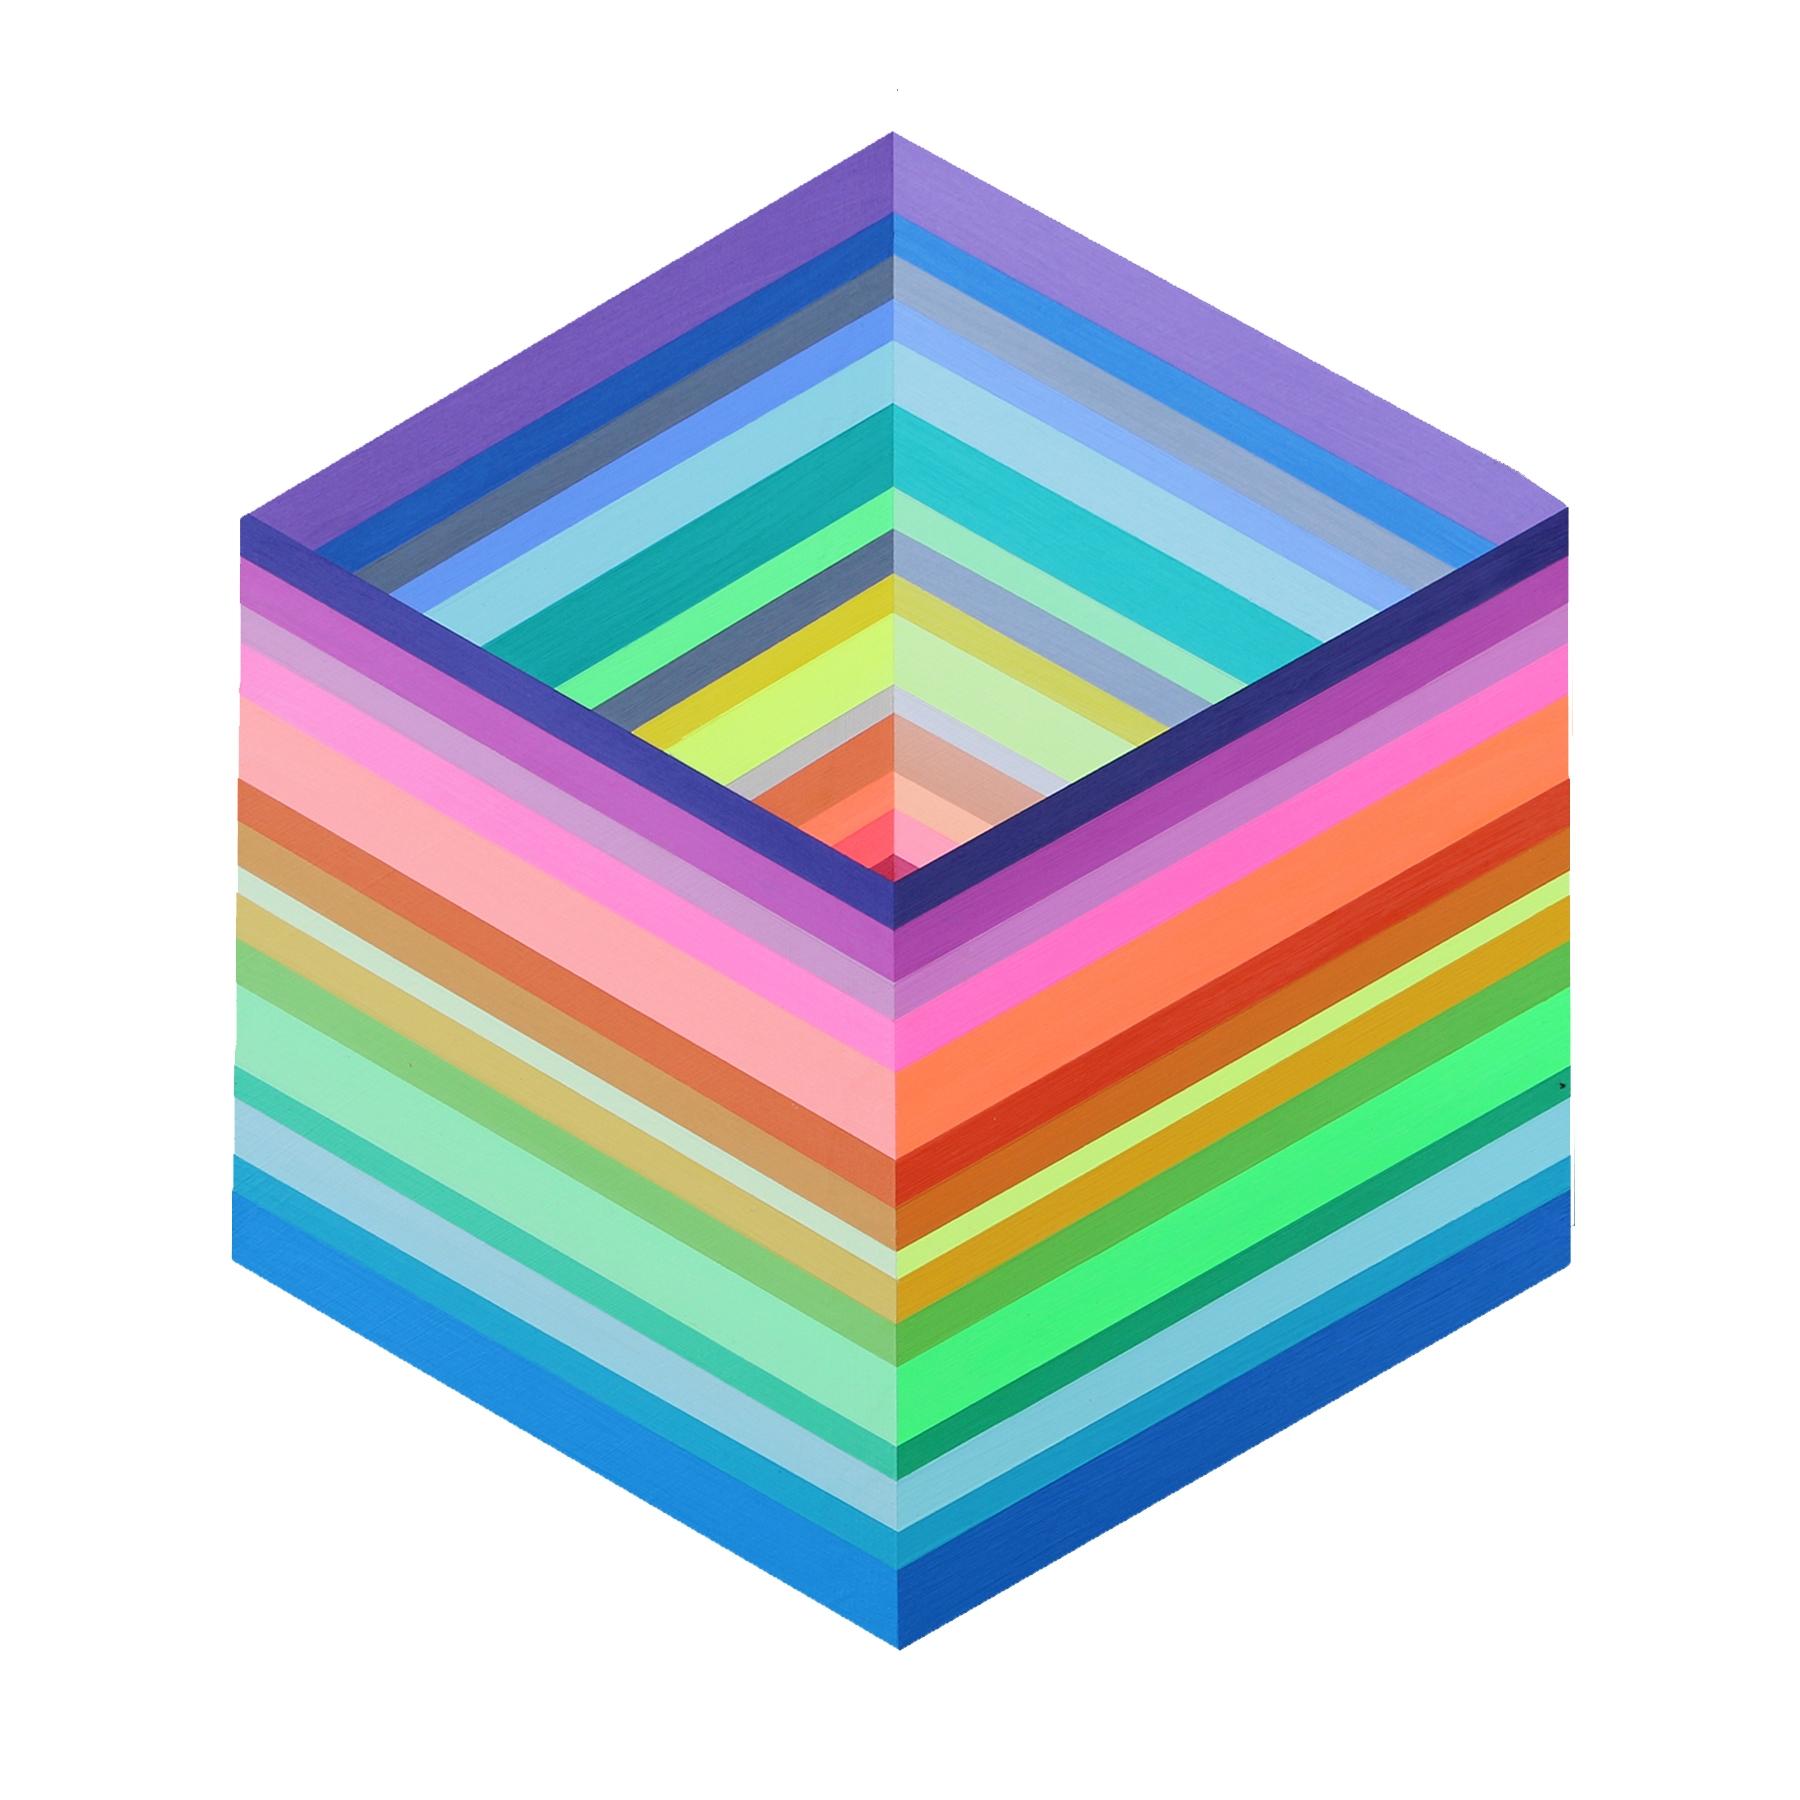 Colourful Container by Kristofir  Dean